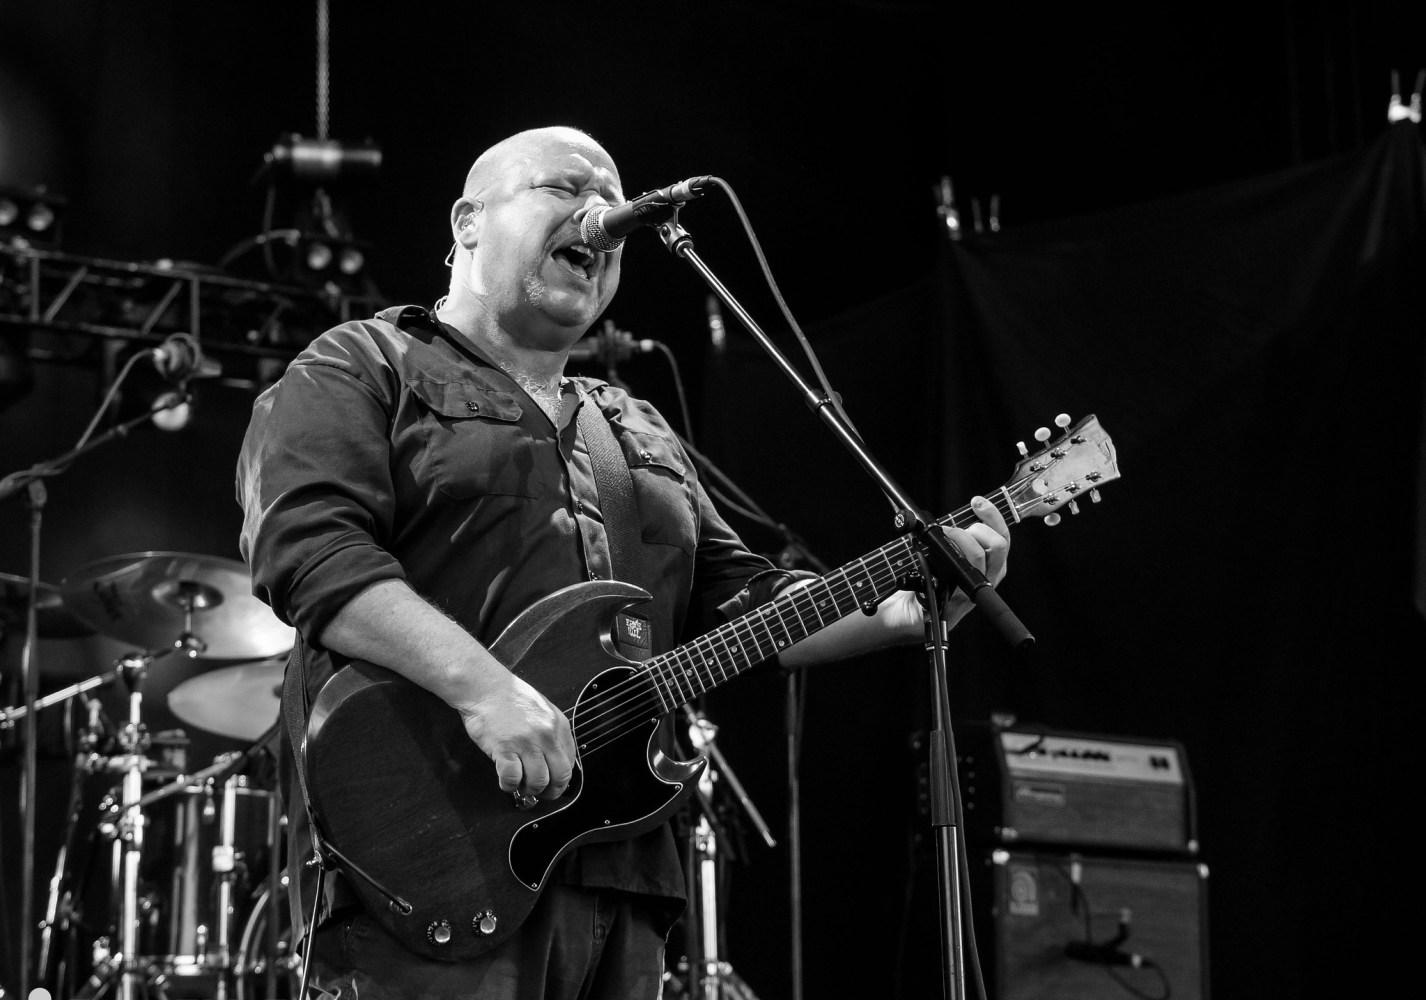 The Pixies - Riverbend Music Center Cincinnati, OH - 7/6/18